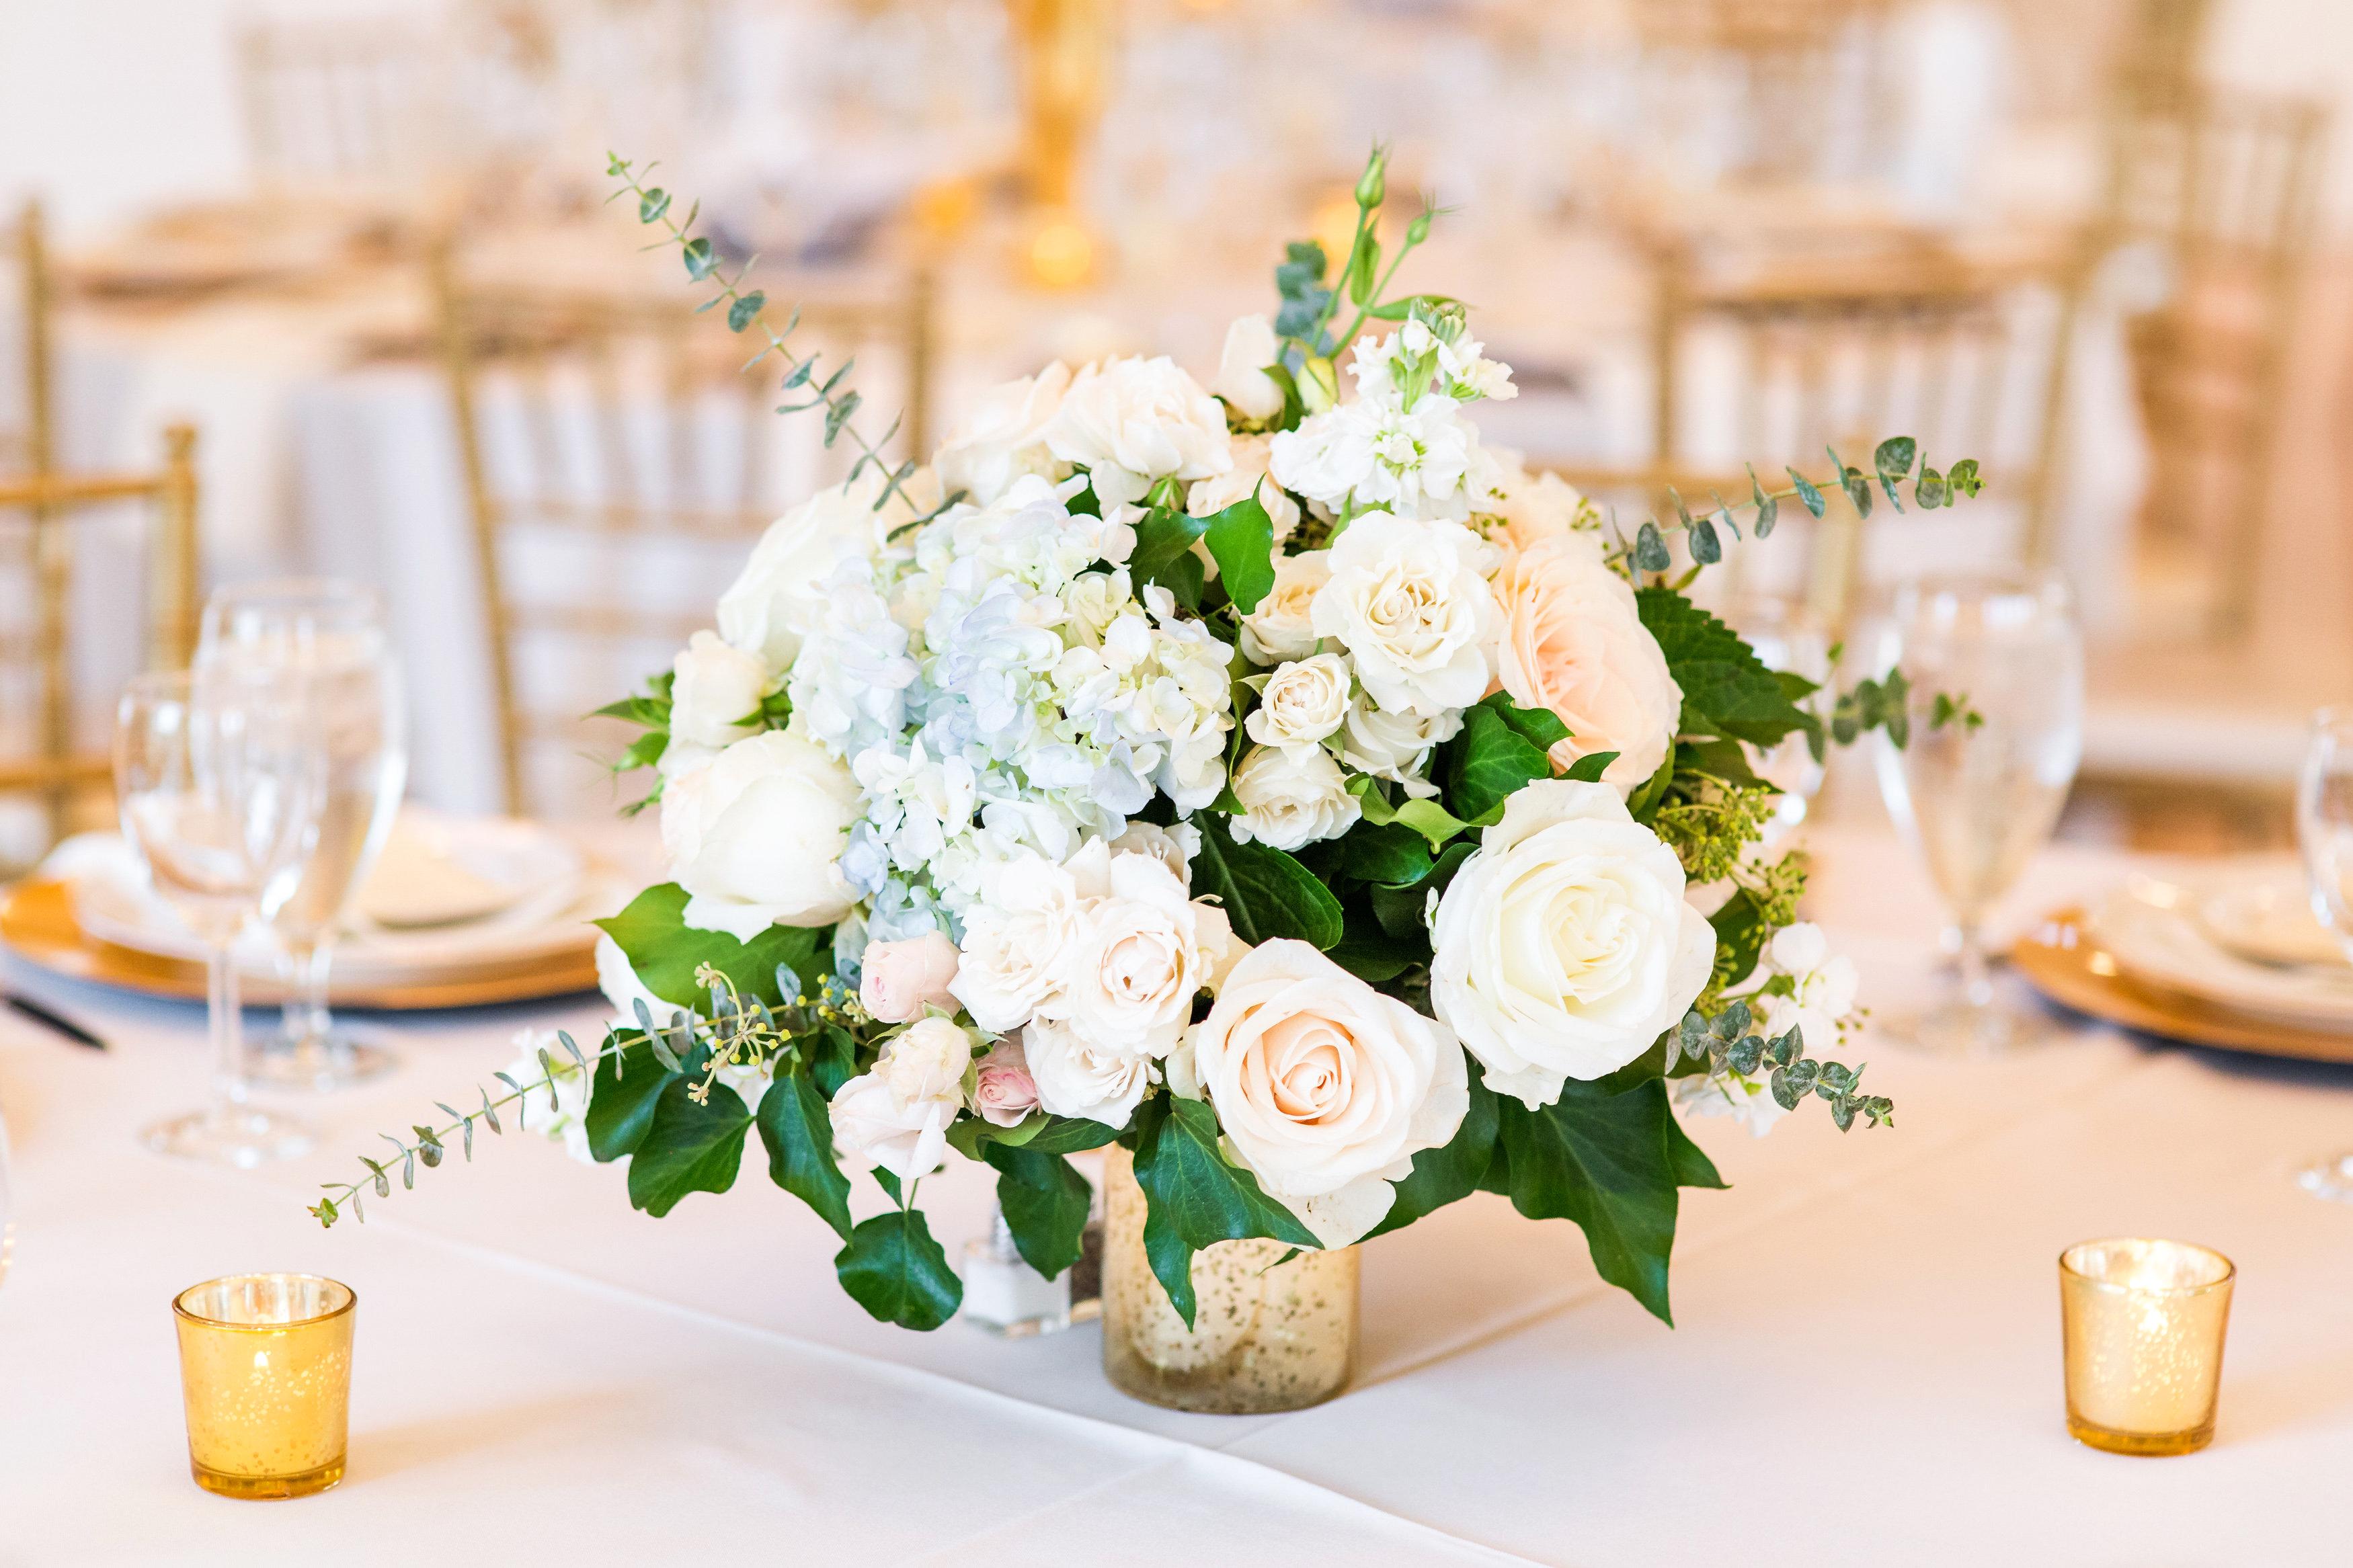 kenisha wendall wedding centerpieces flowers candles